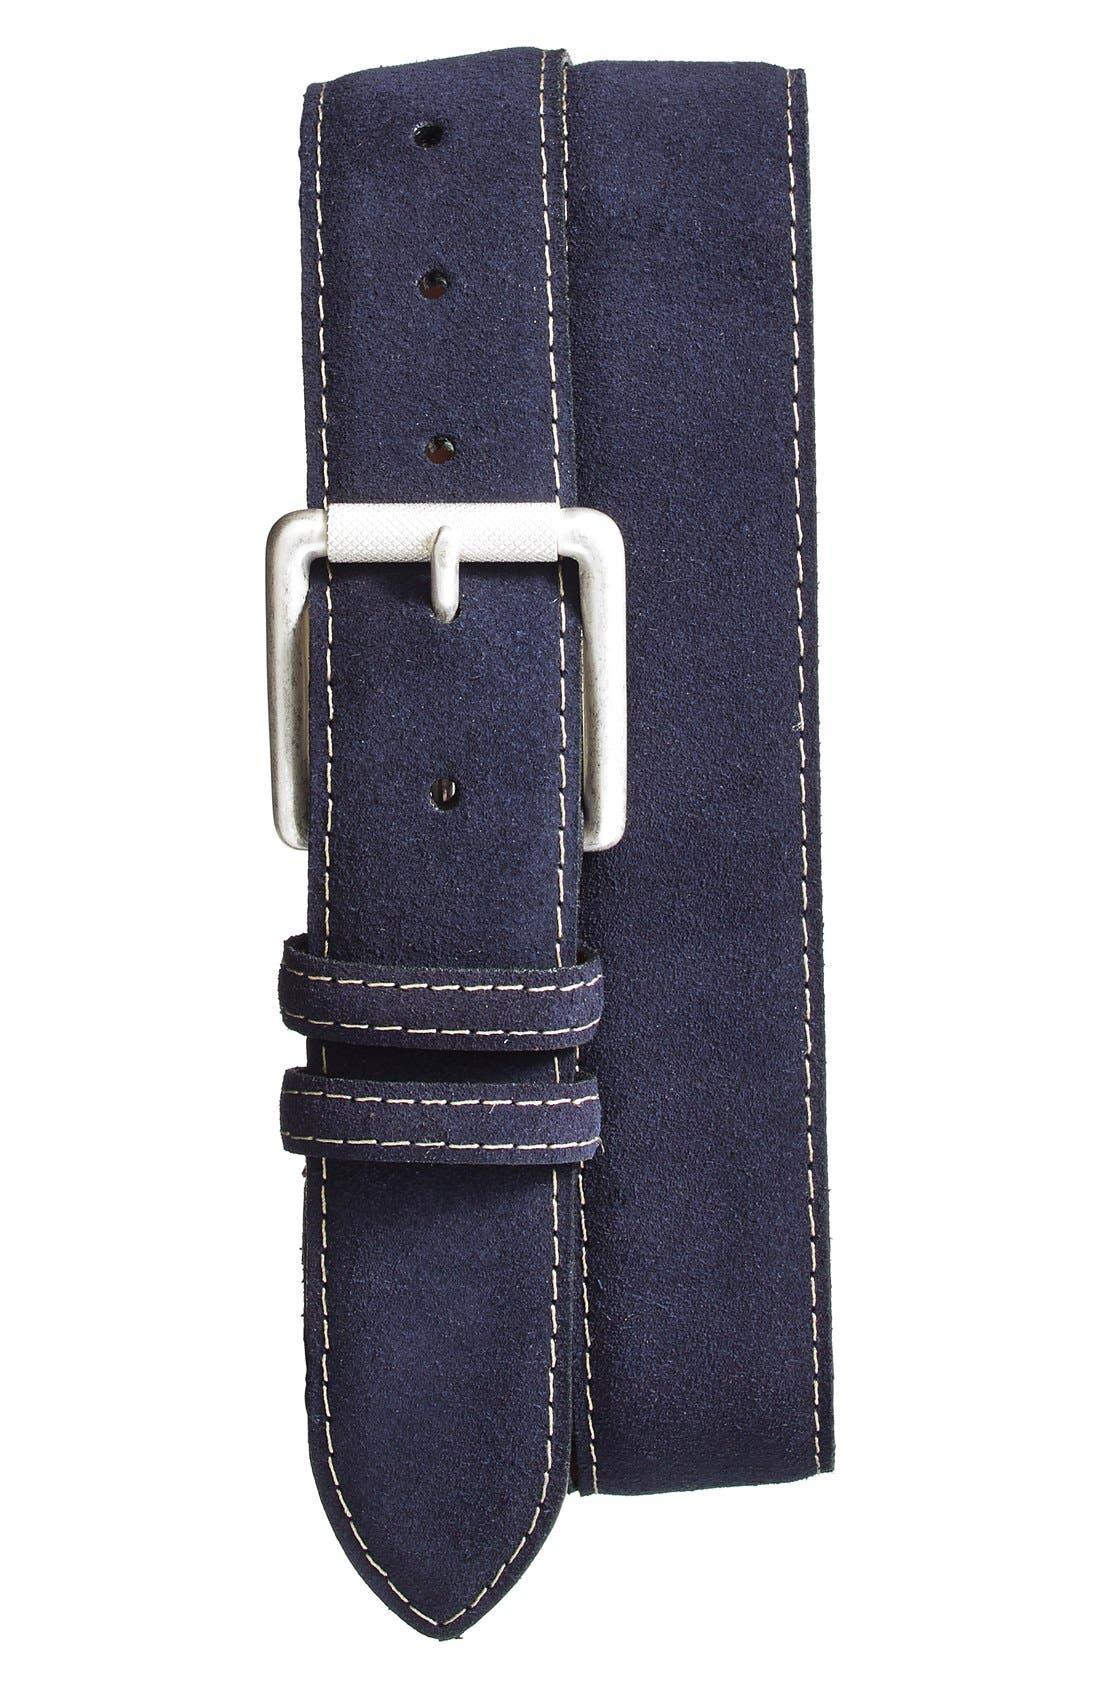 Torino Belts Suede Belt, Navy